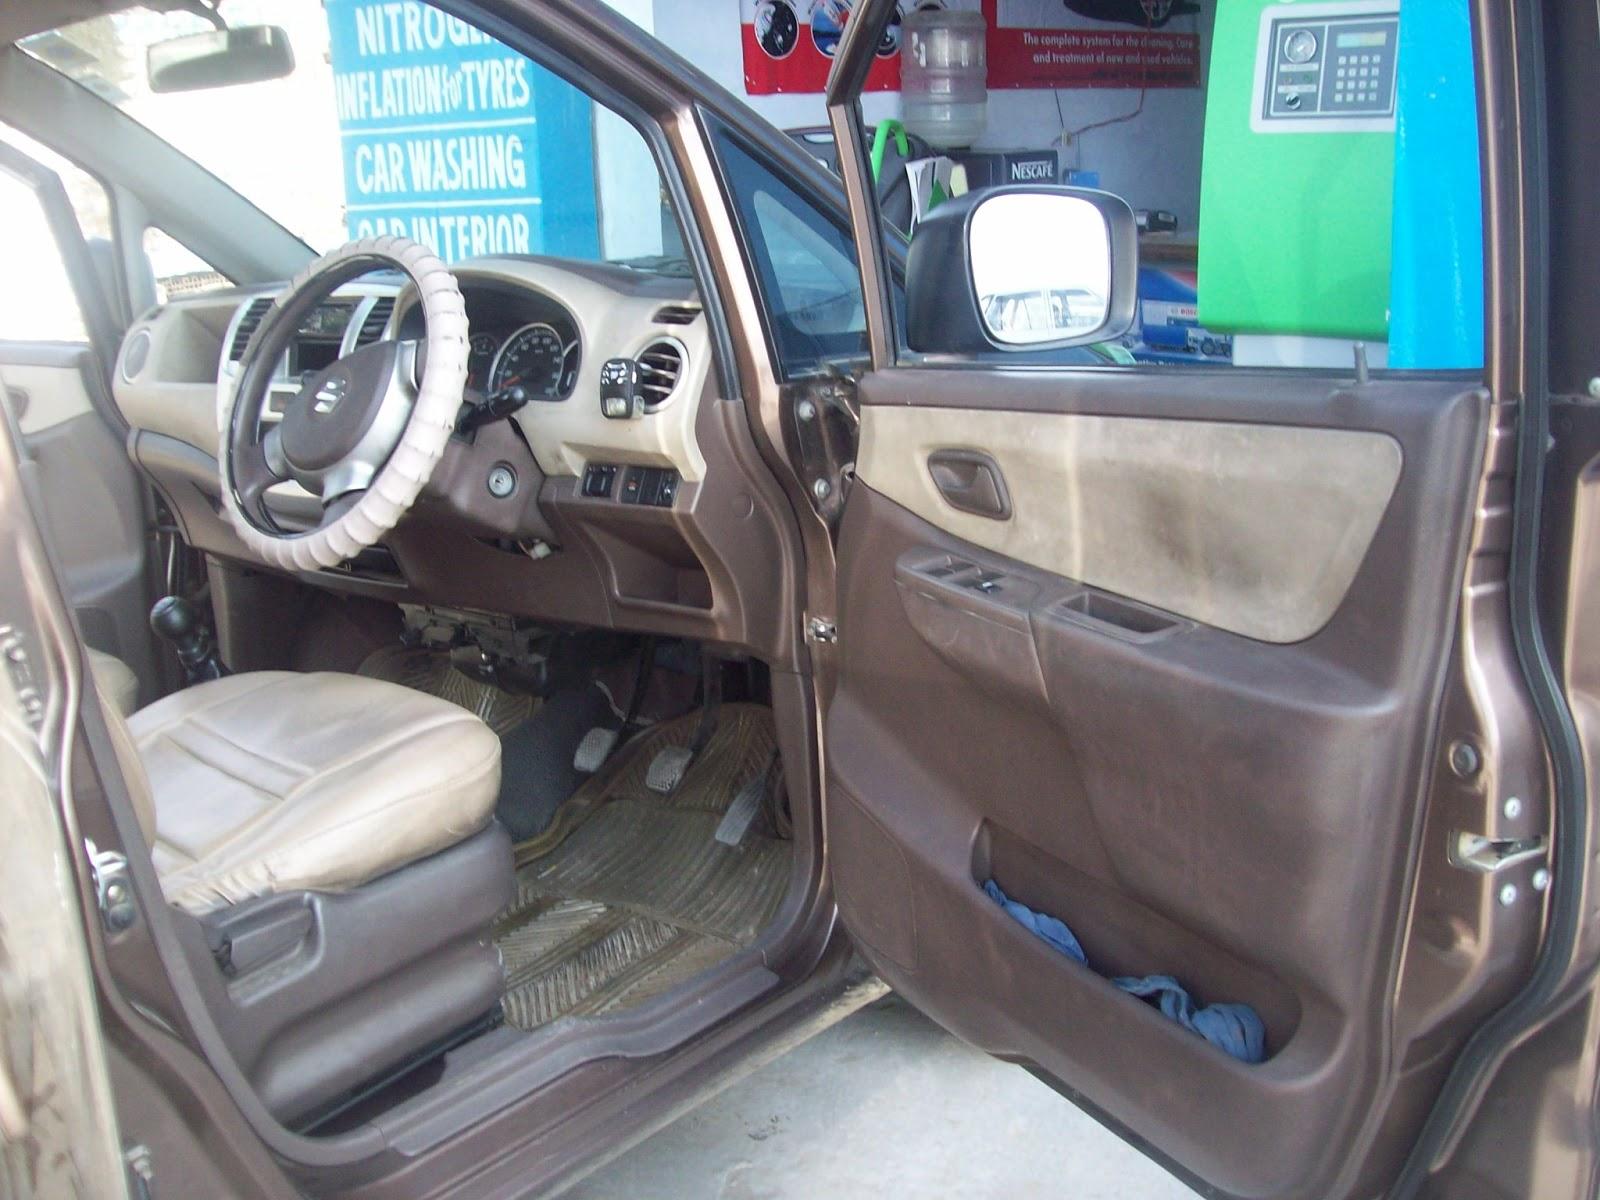 megapower bosch car service jammu car interior cleaning at megapower services. Black Bedroom Furniture Sets. Home Design Ideas